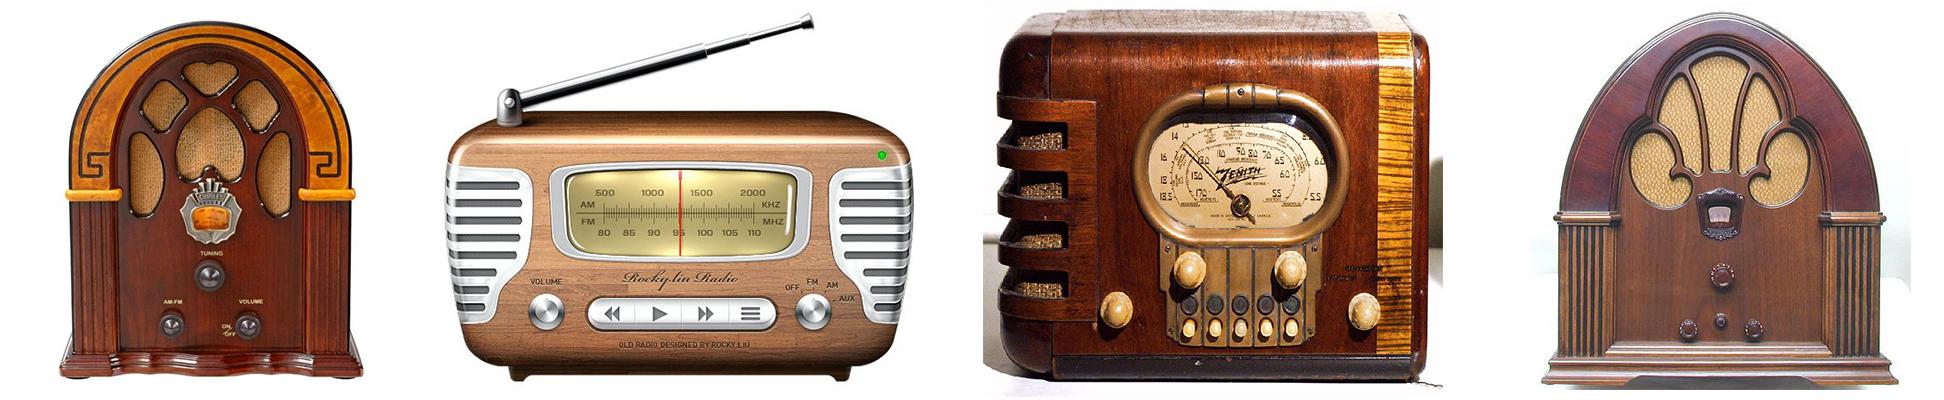 Vintage-Radios_4.jpg